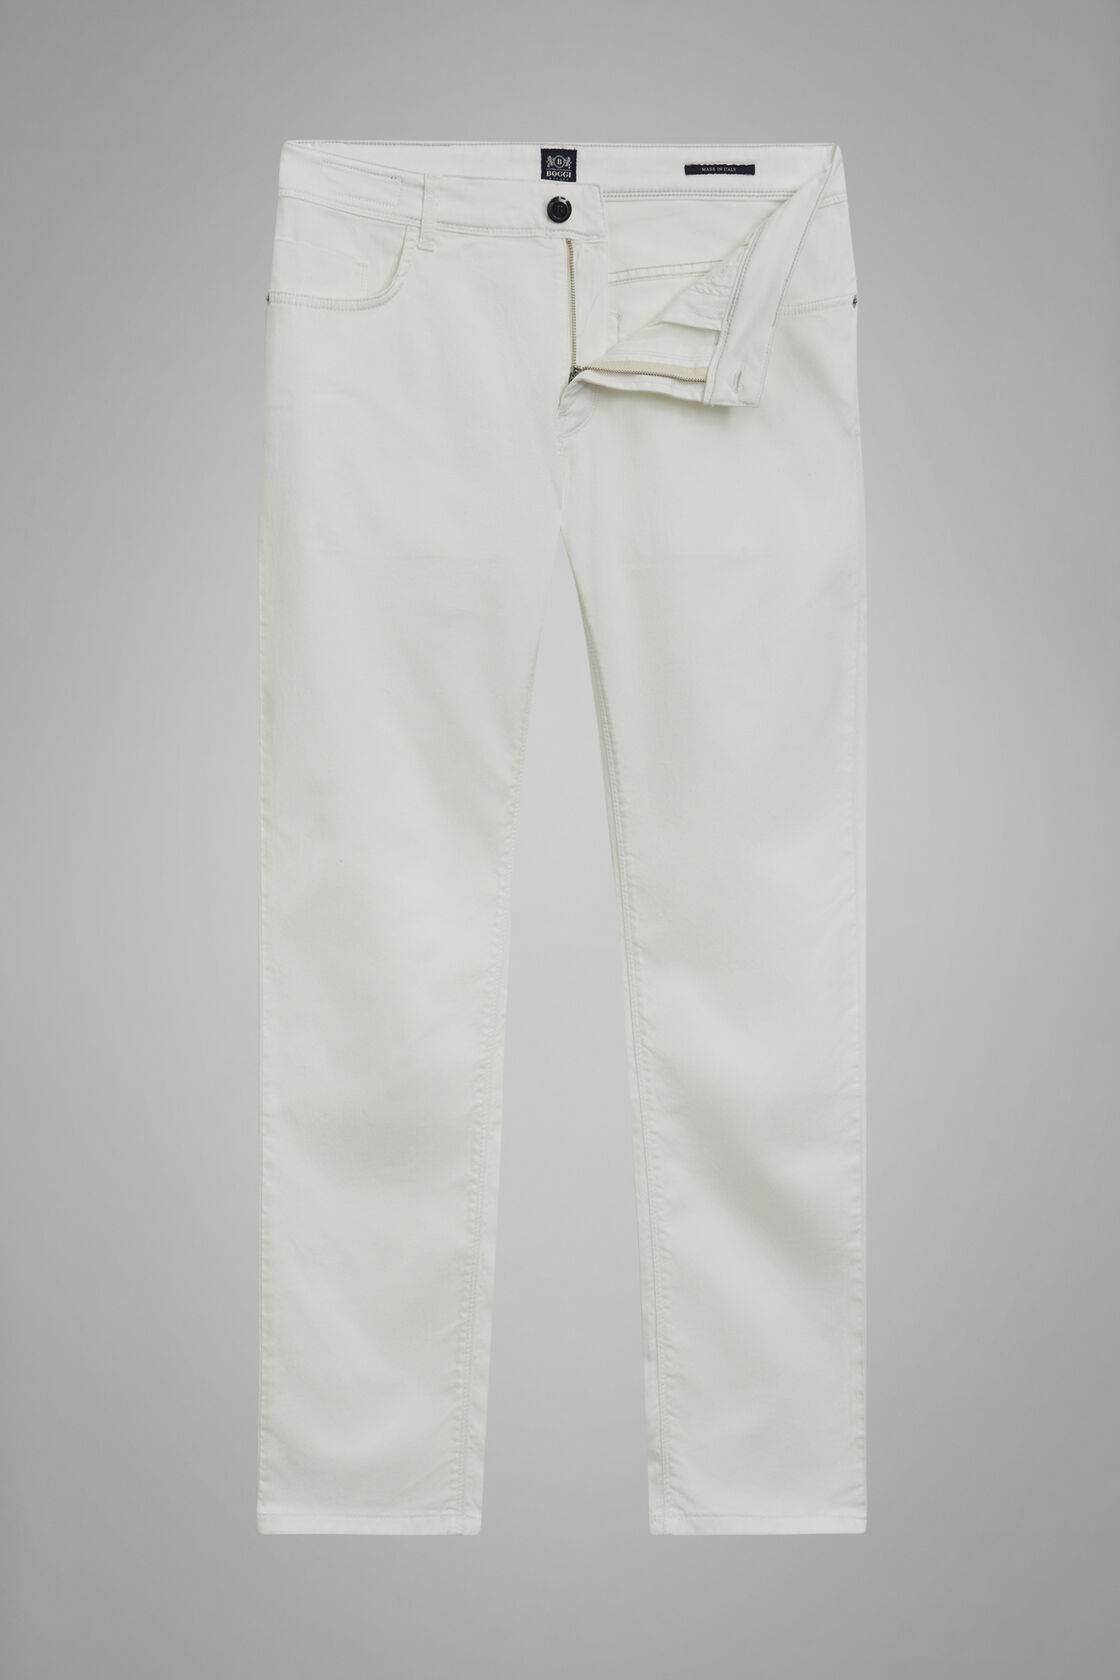 Pantalone 5 Tasche In Cotone Gabardina Tencel Regualr Fit, , hi-res